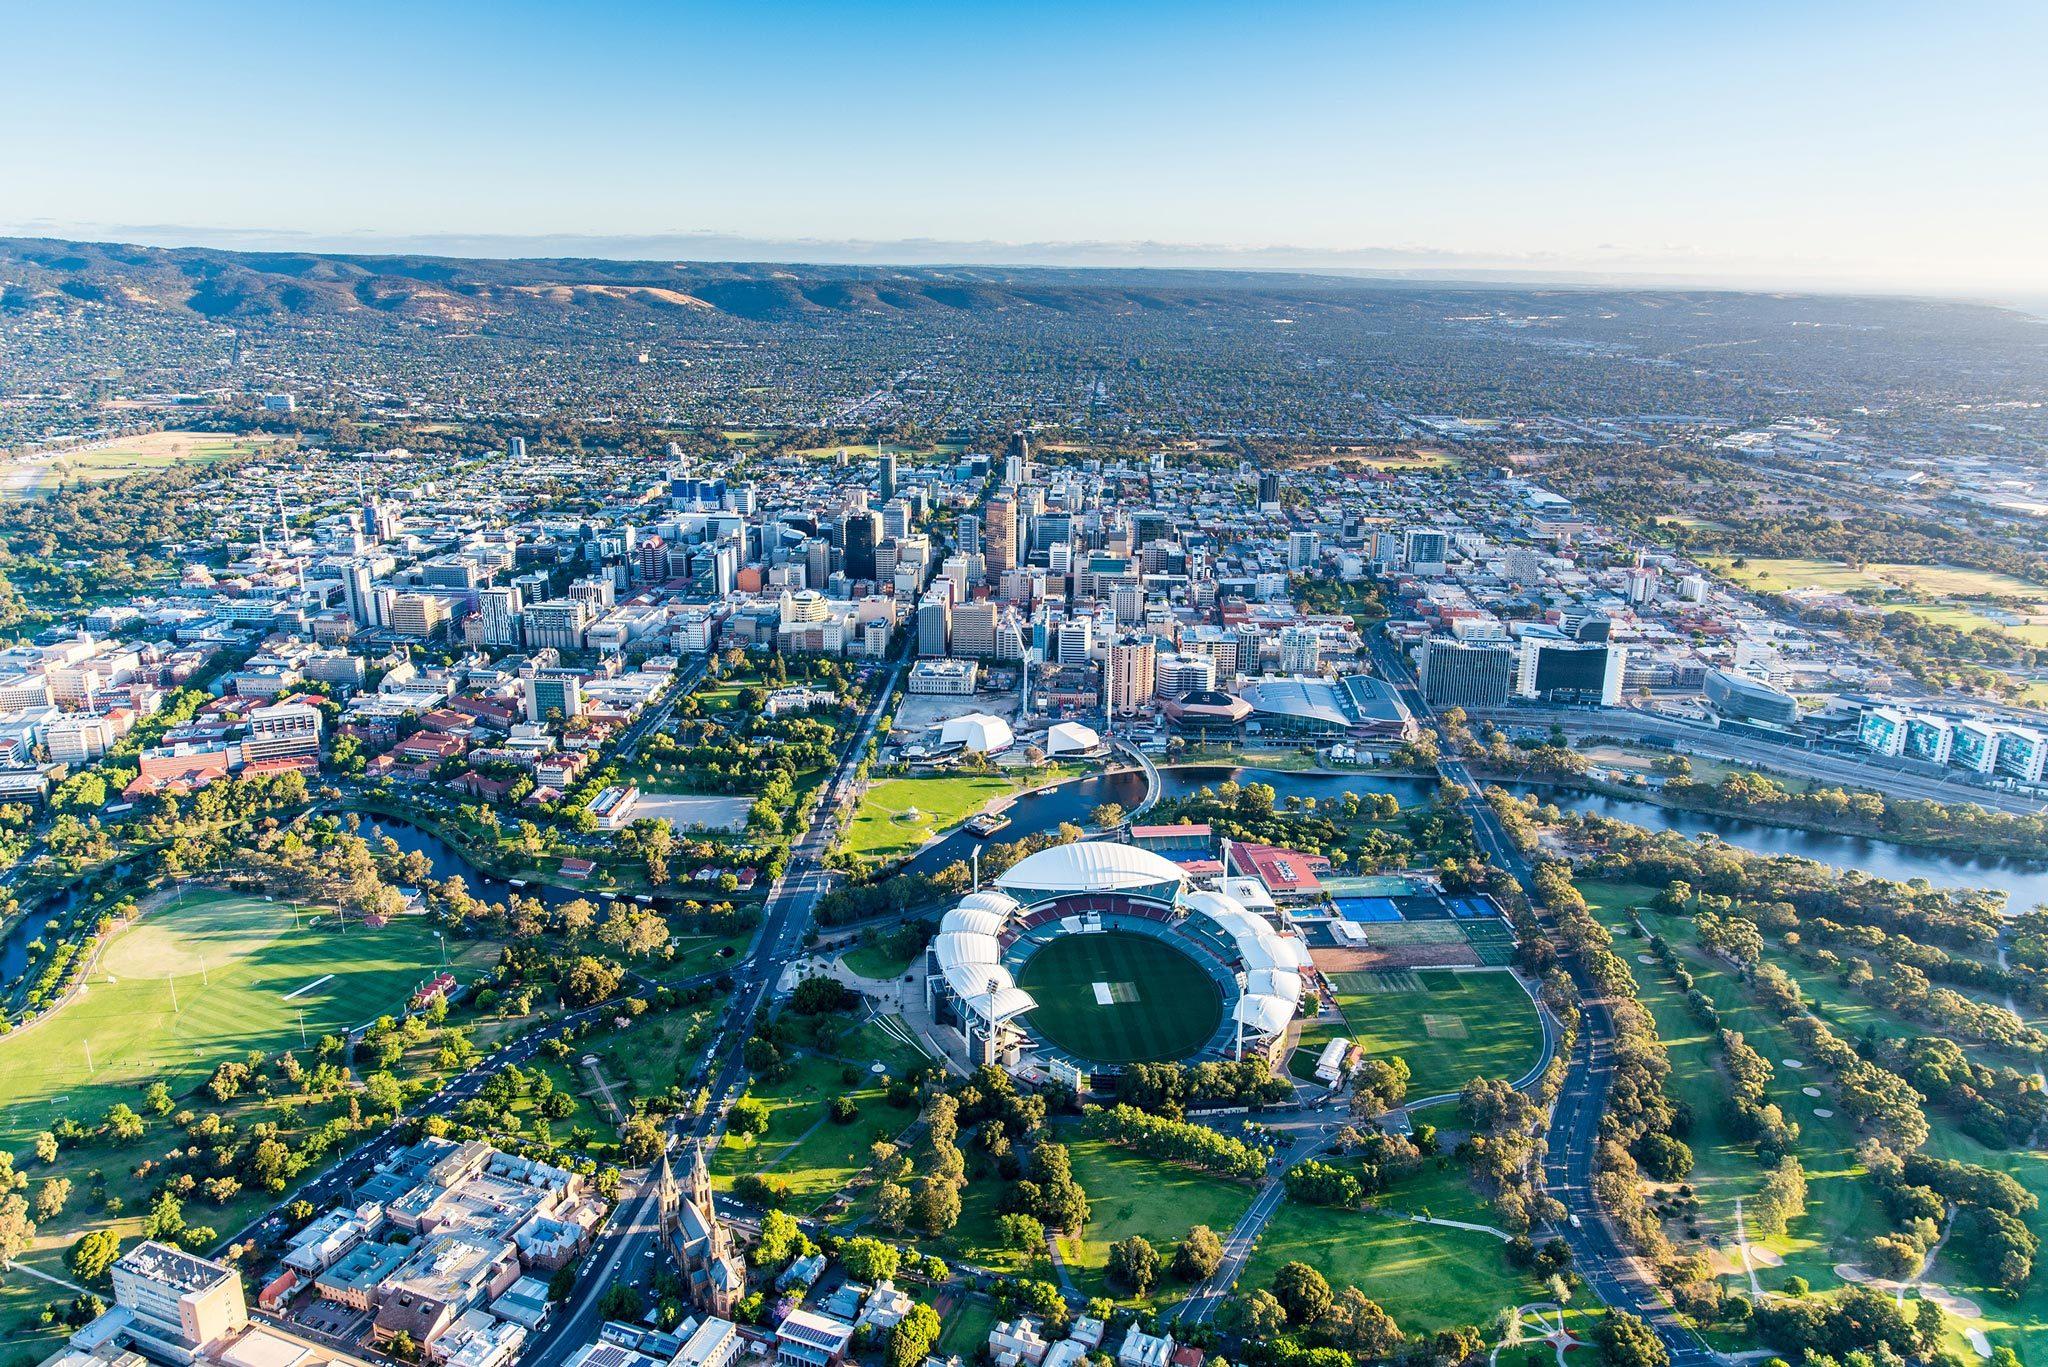 Adelaide, Australie-Méridionale   AustralieMag